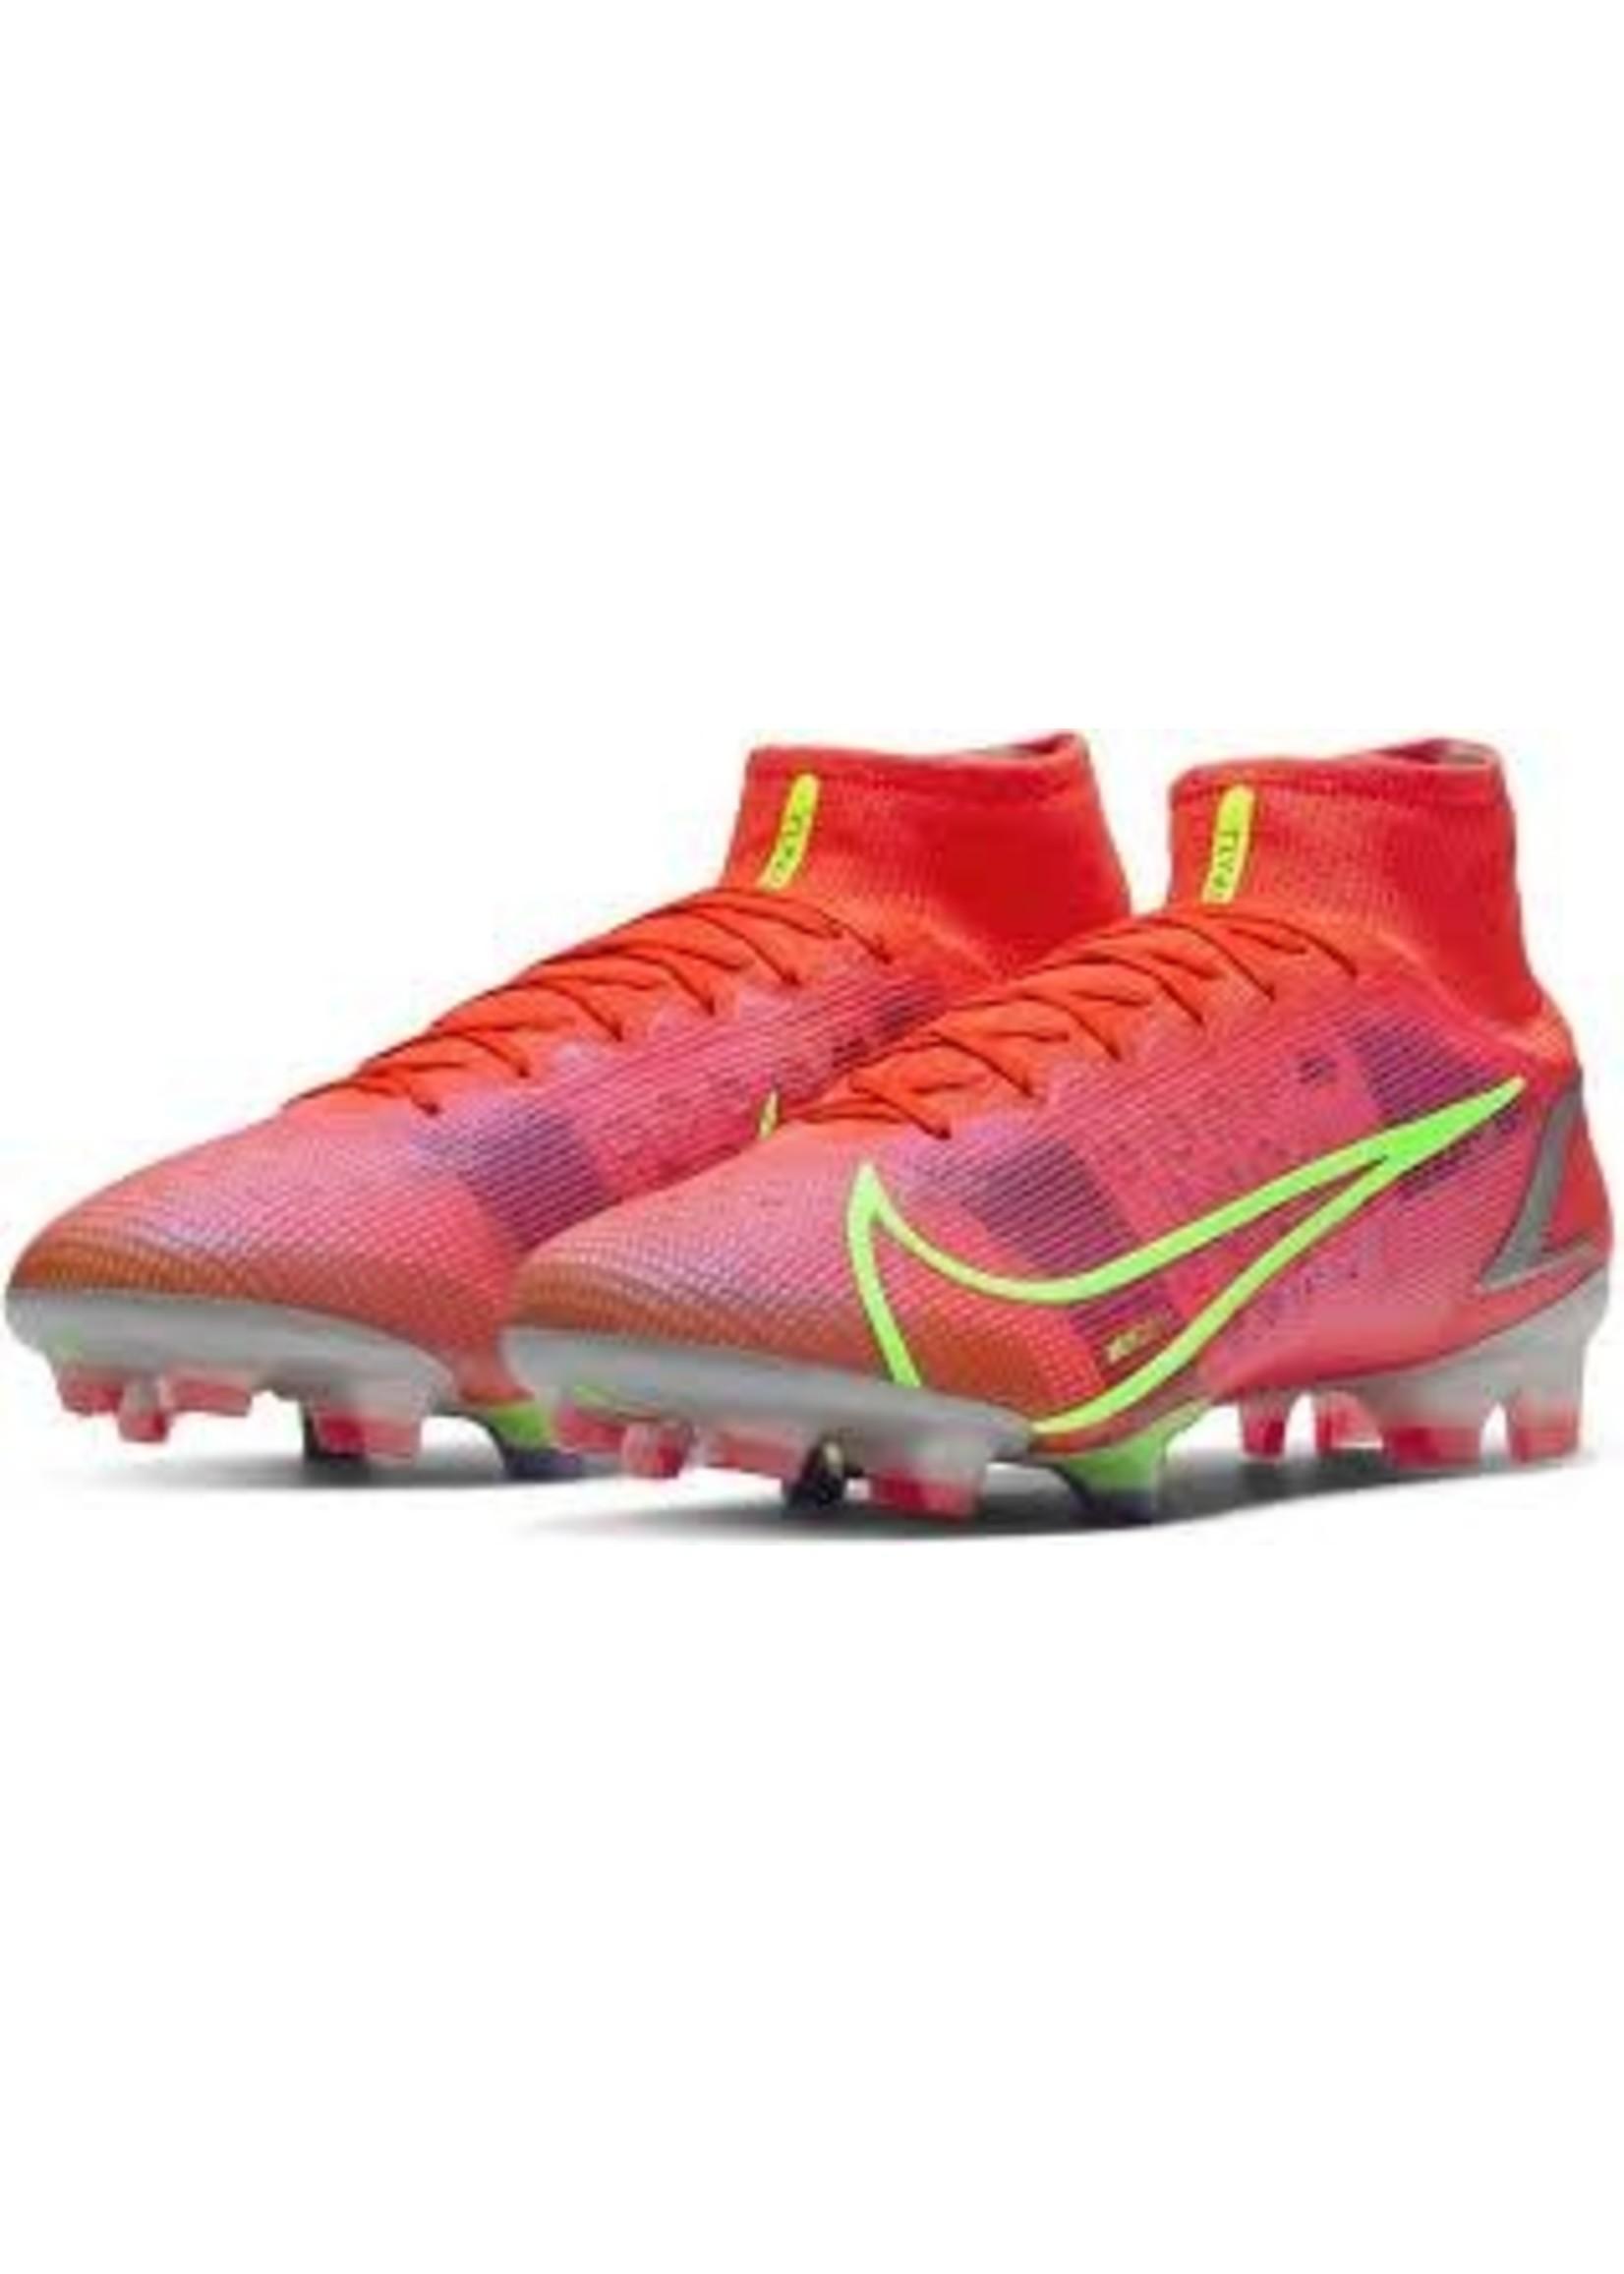 Nike SUPERFLY 8 ELITE FG